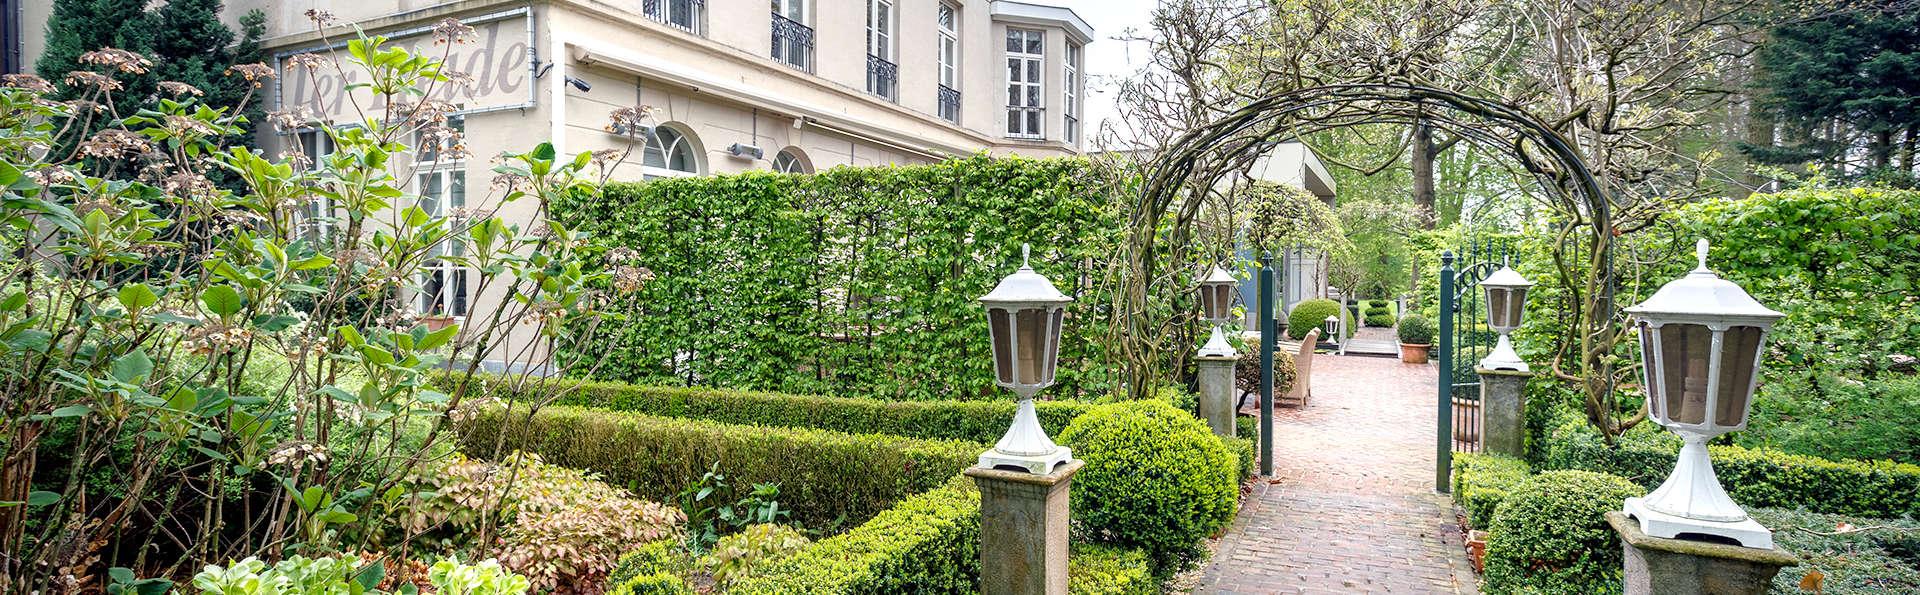 Hotel Ter Heide - Edit_Entrance.jpg